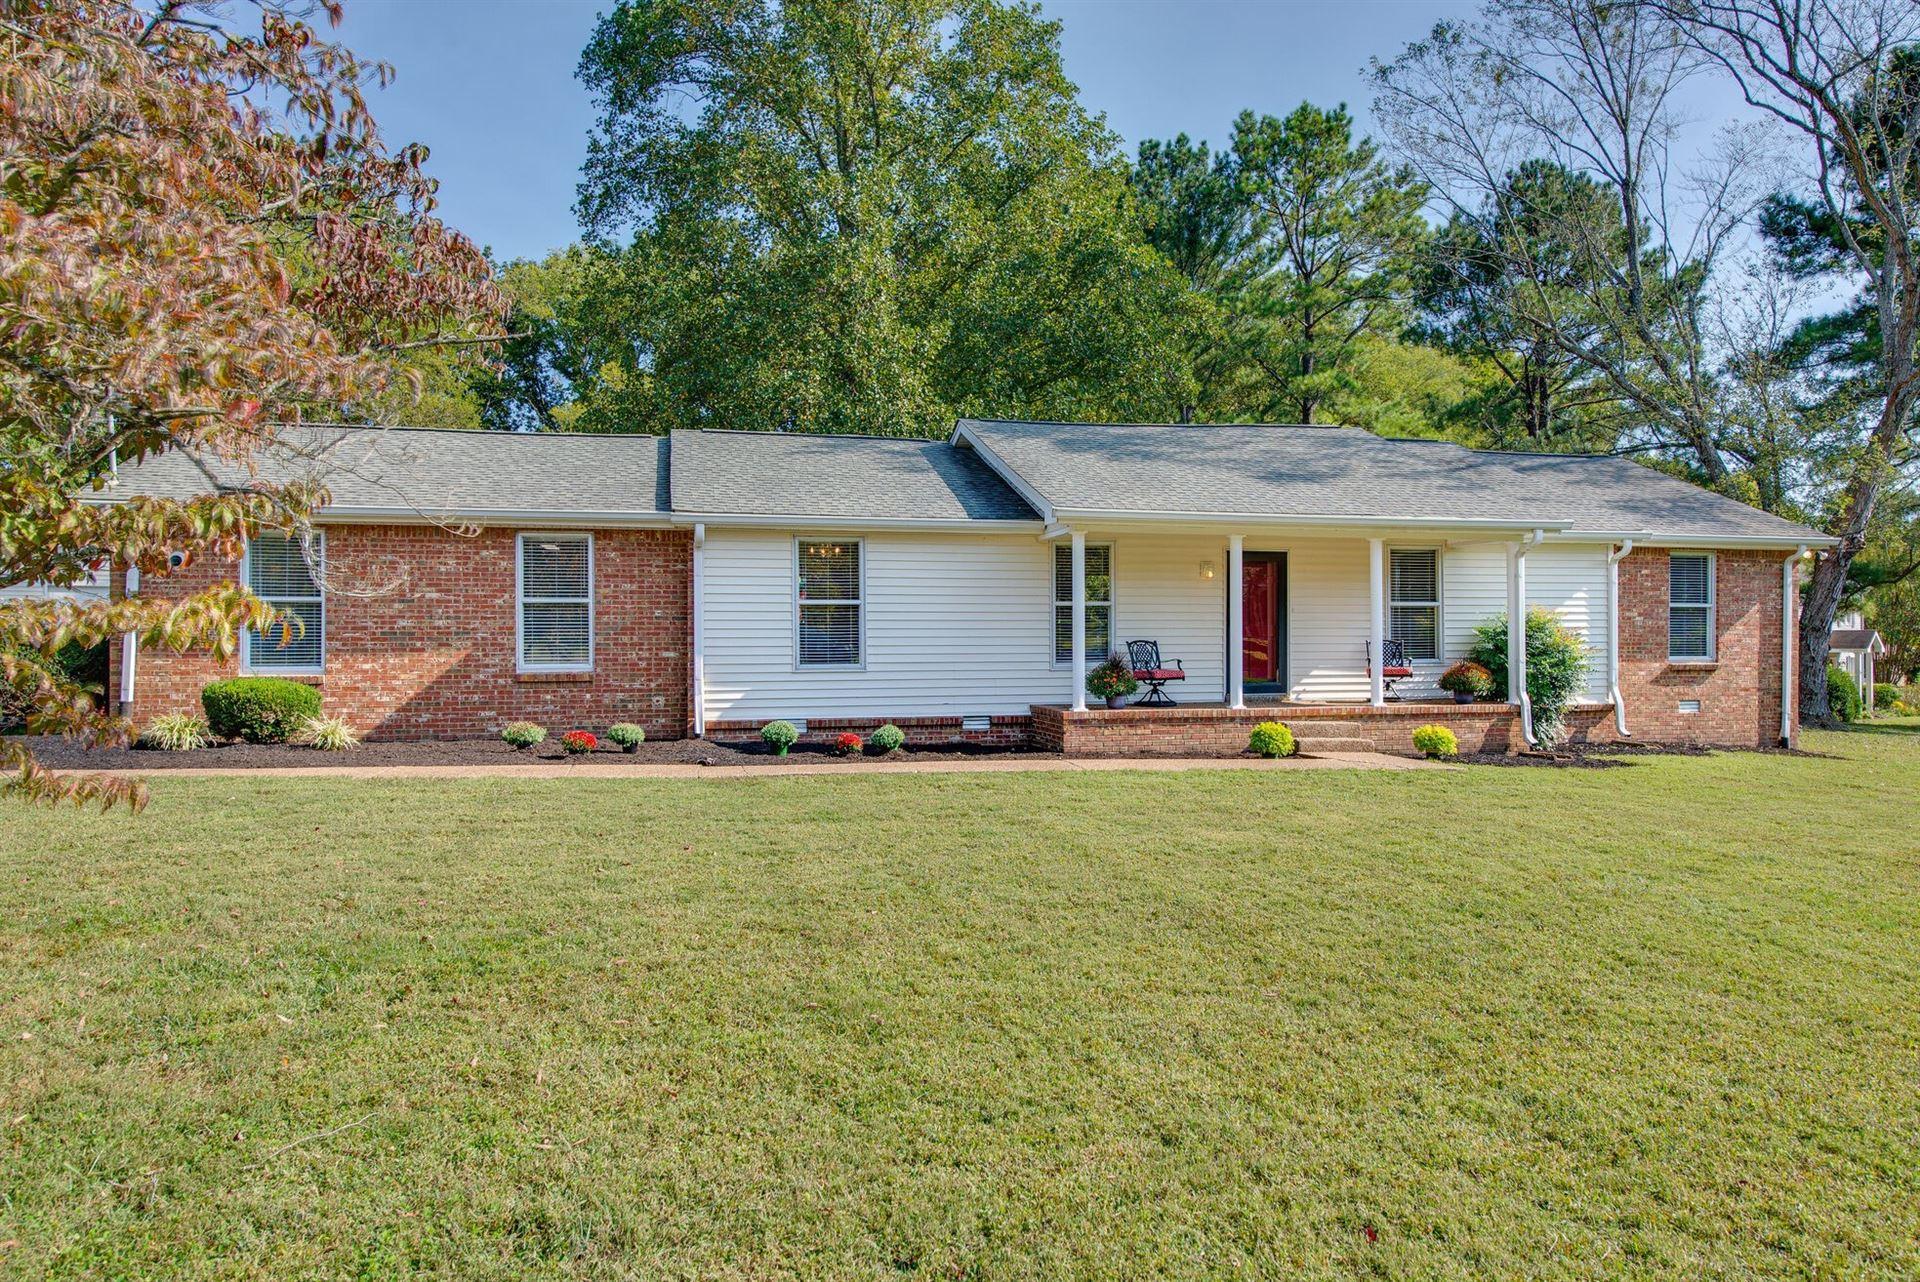 7516 Patomic Dr, Nashville, TN 37221 - MLS#: 2195466